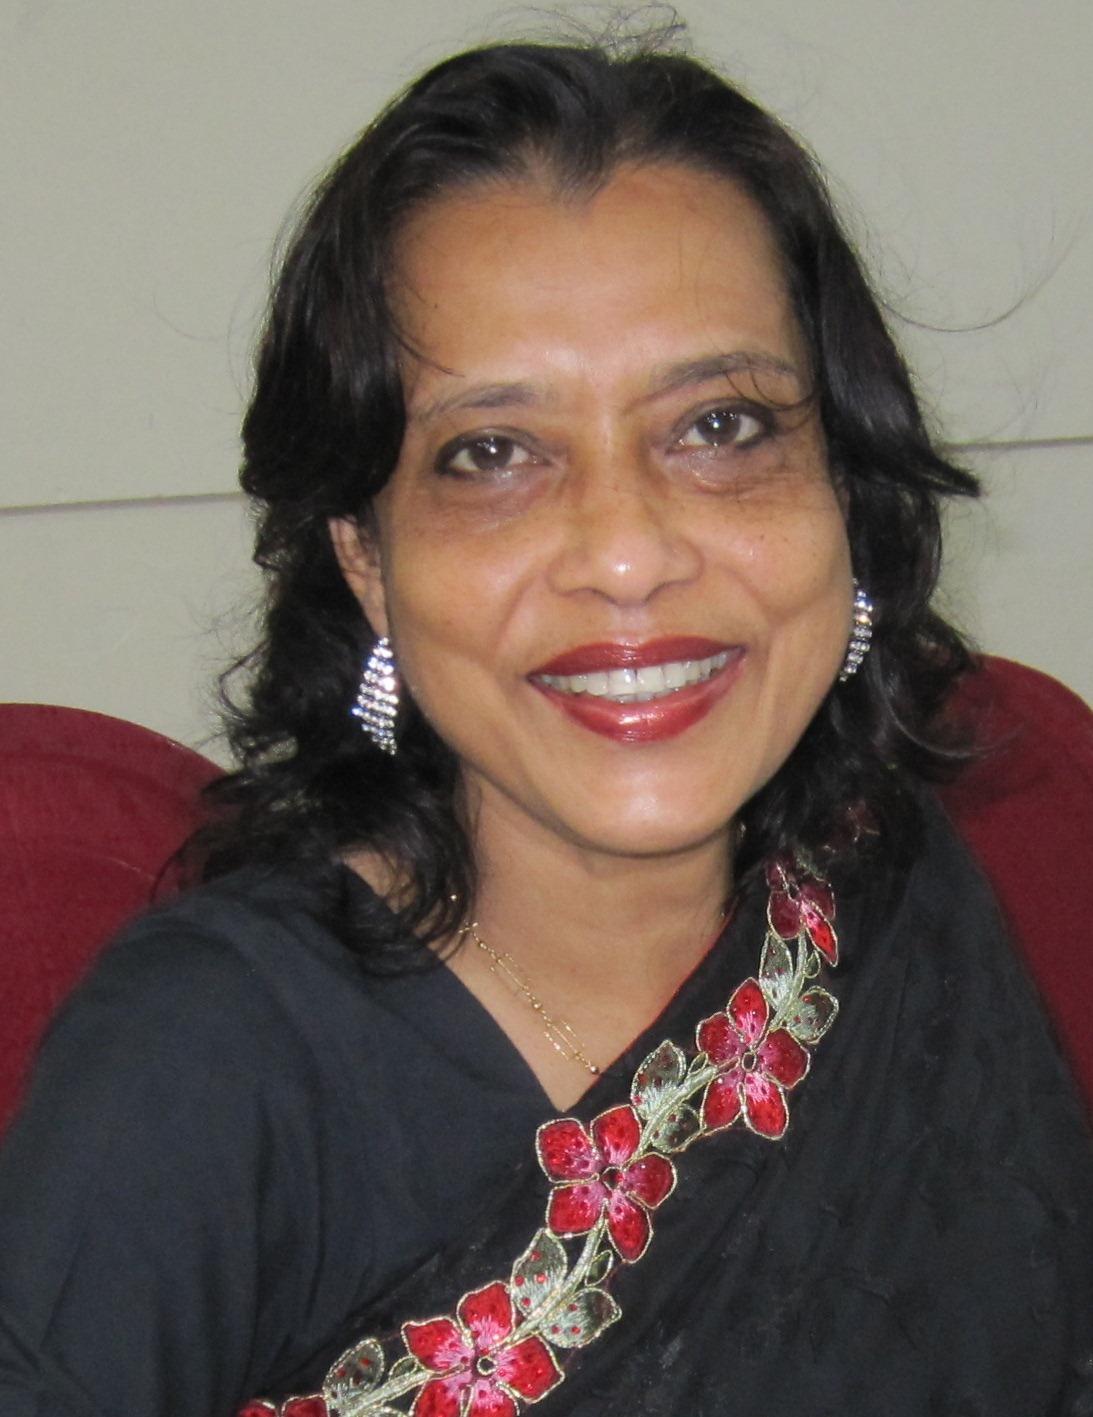 Khaleda Islam